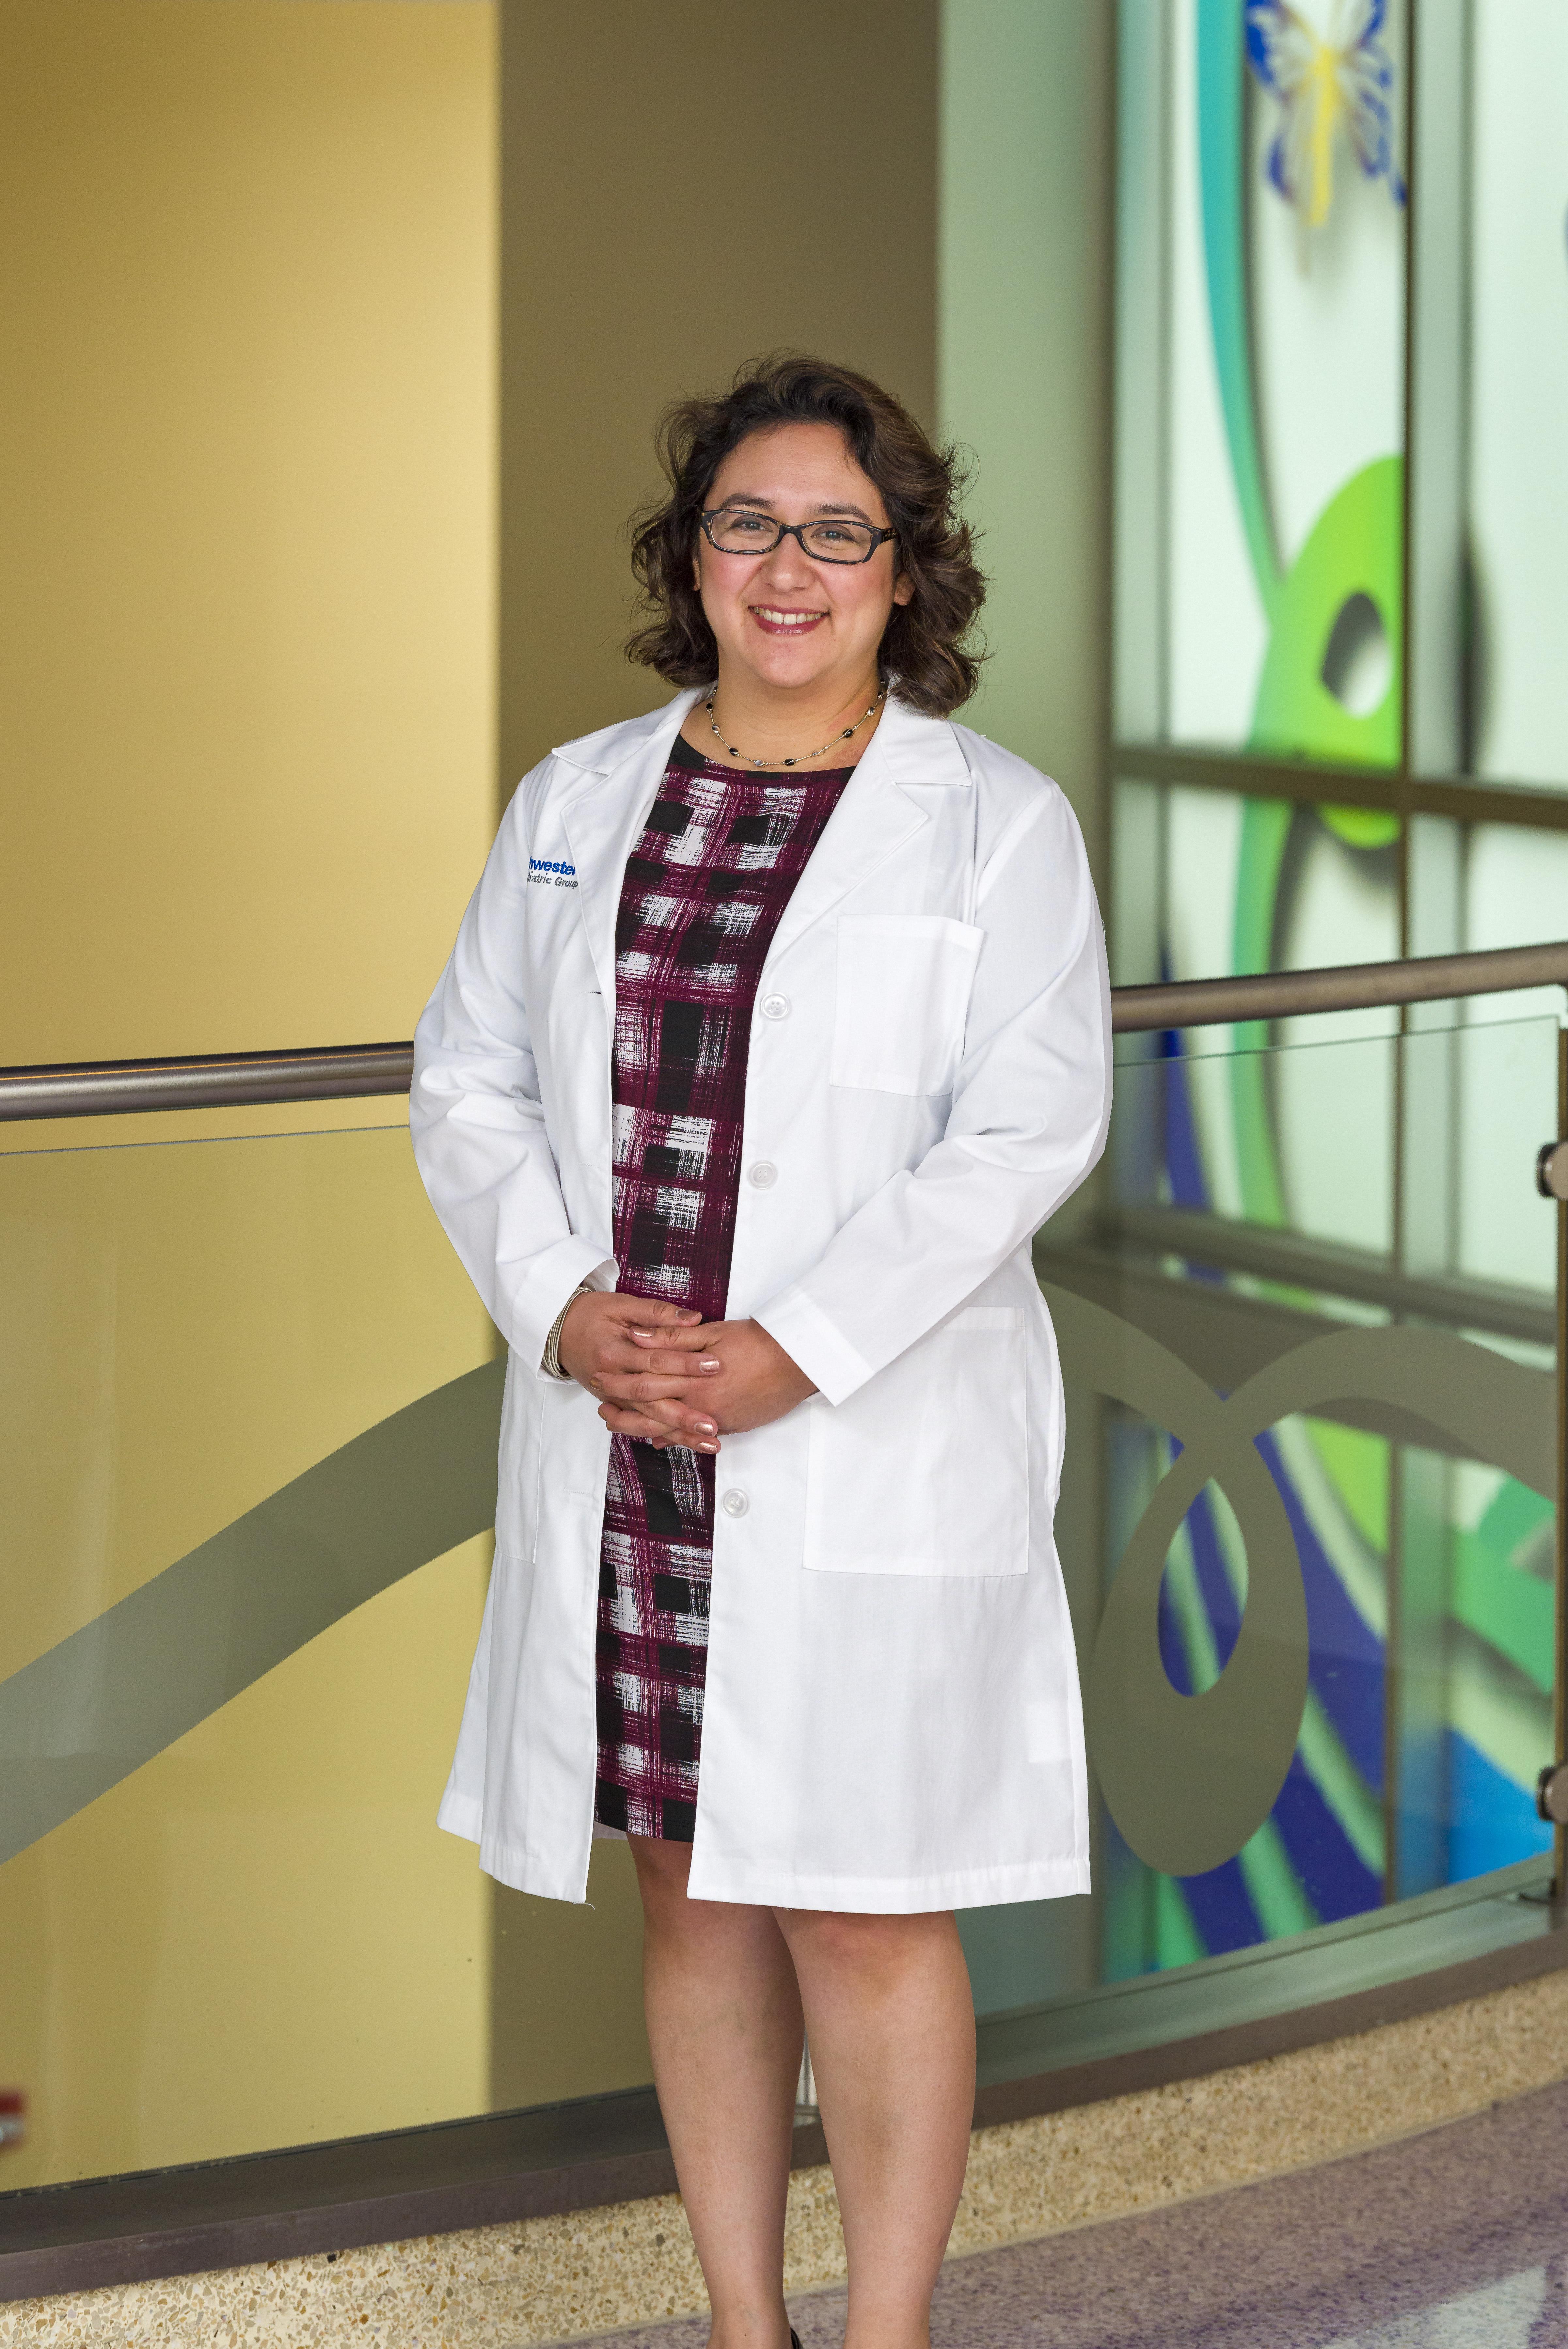 Amanda Evans, MD, UT Southwestern Medical Center